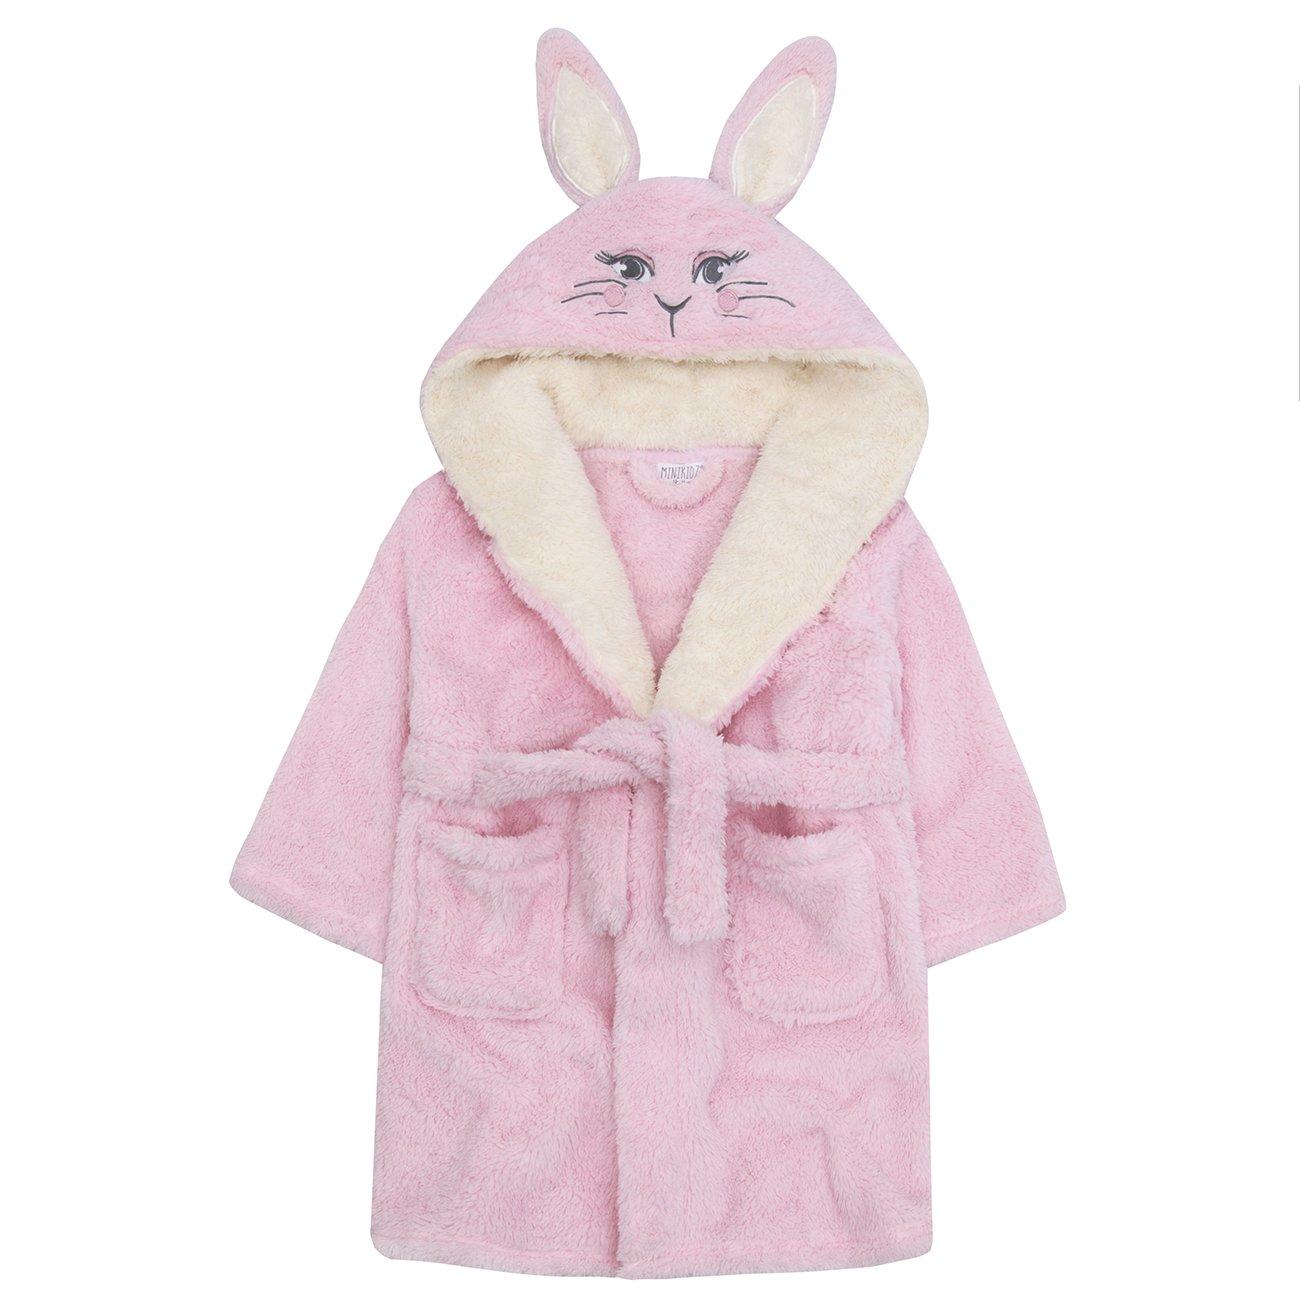 Minikidz Girls Bunny Rabbit Robe Kids Plush Hooded Soft Fleece Bath Robe Novelty Dressing Gown Xmas Gift Present 2-13 Years Grey Pink